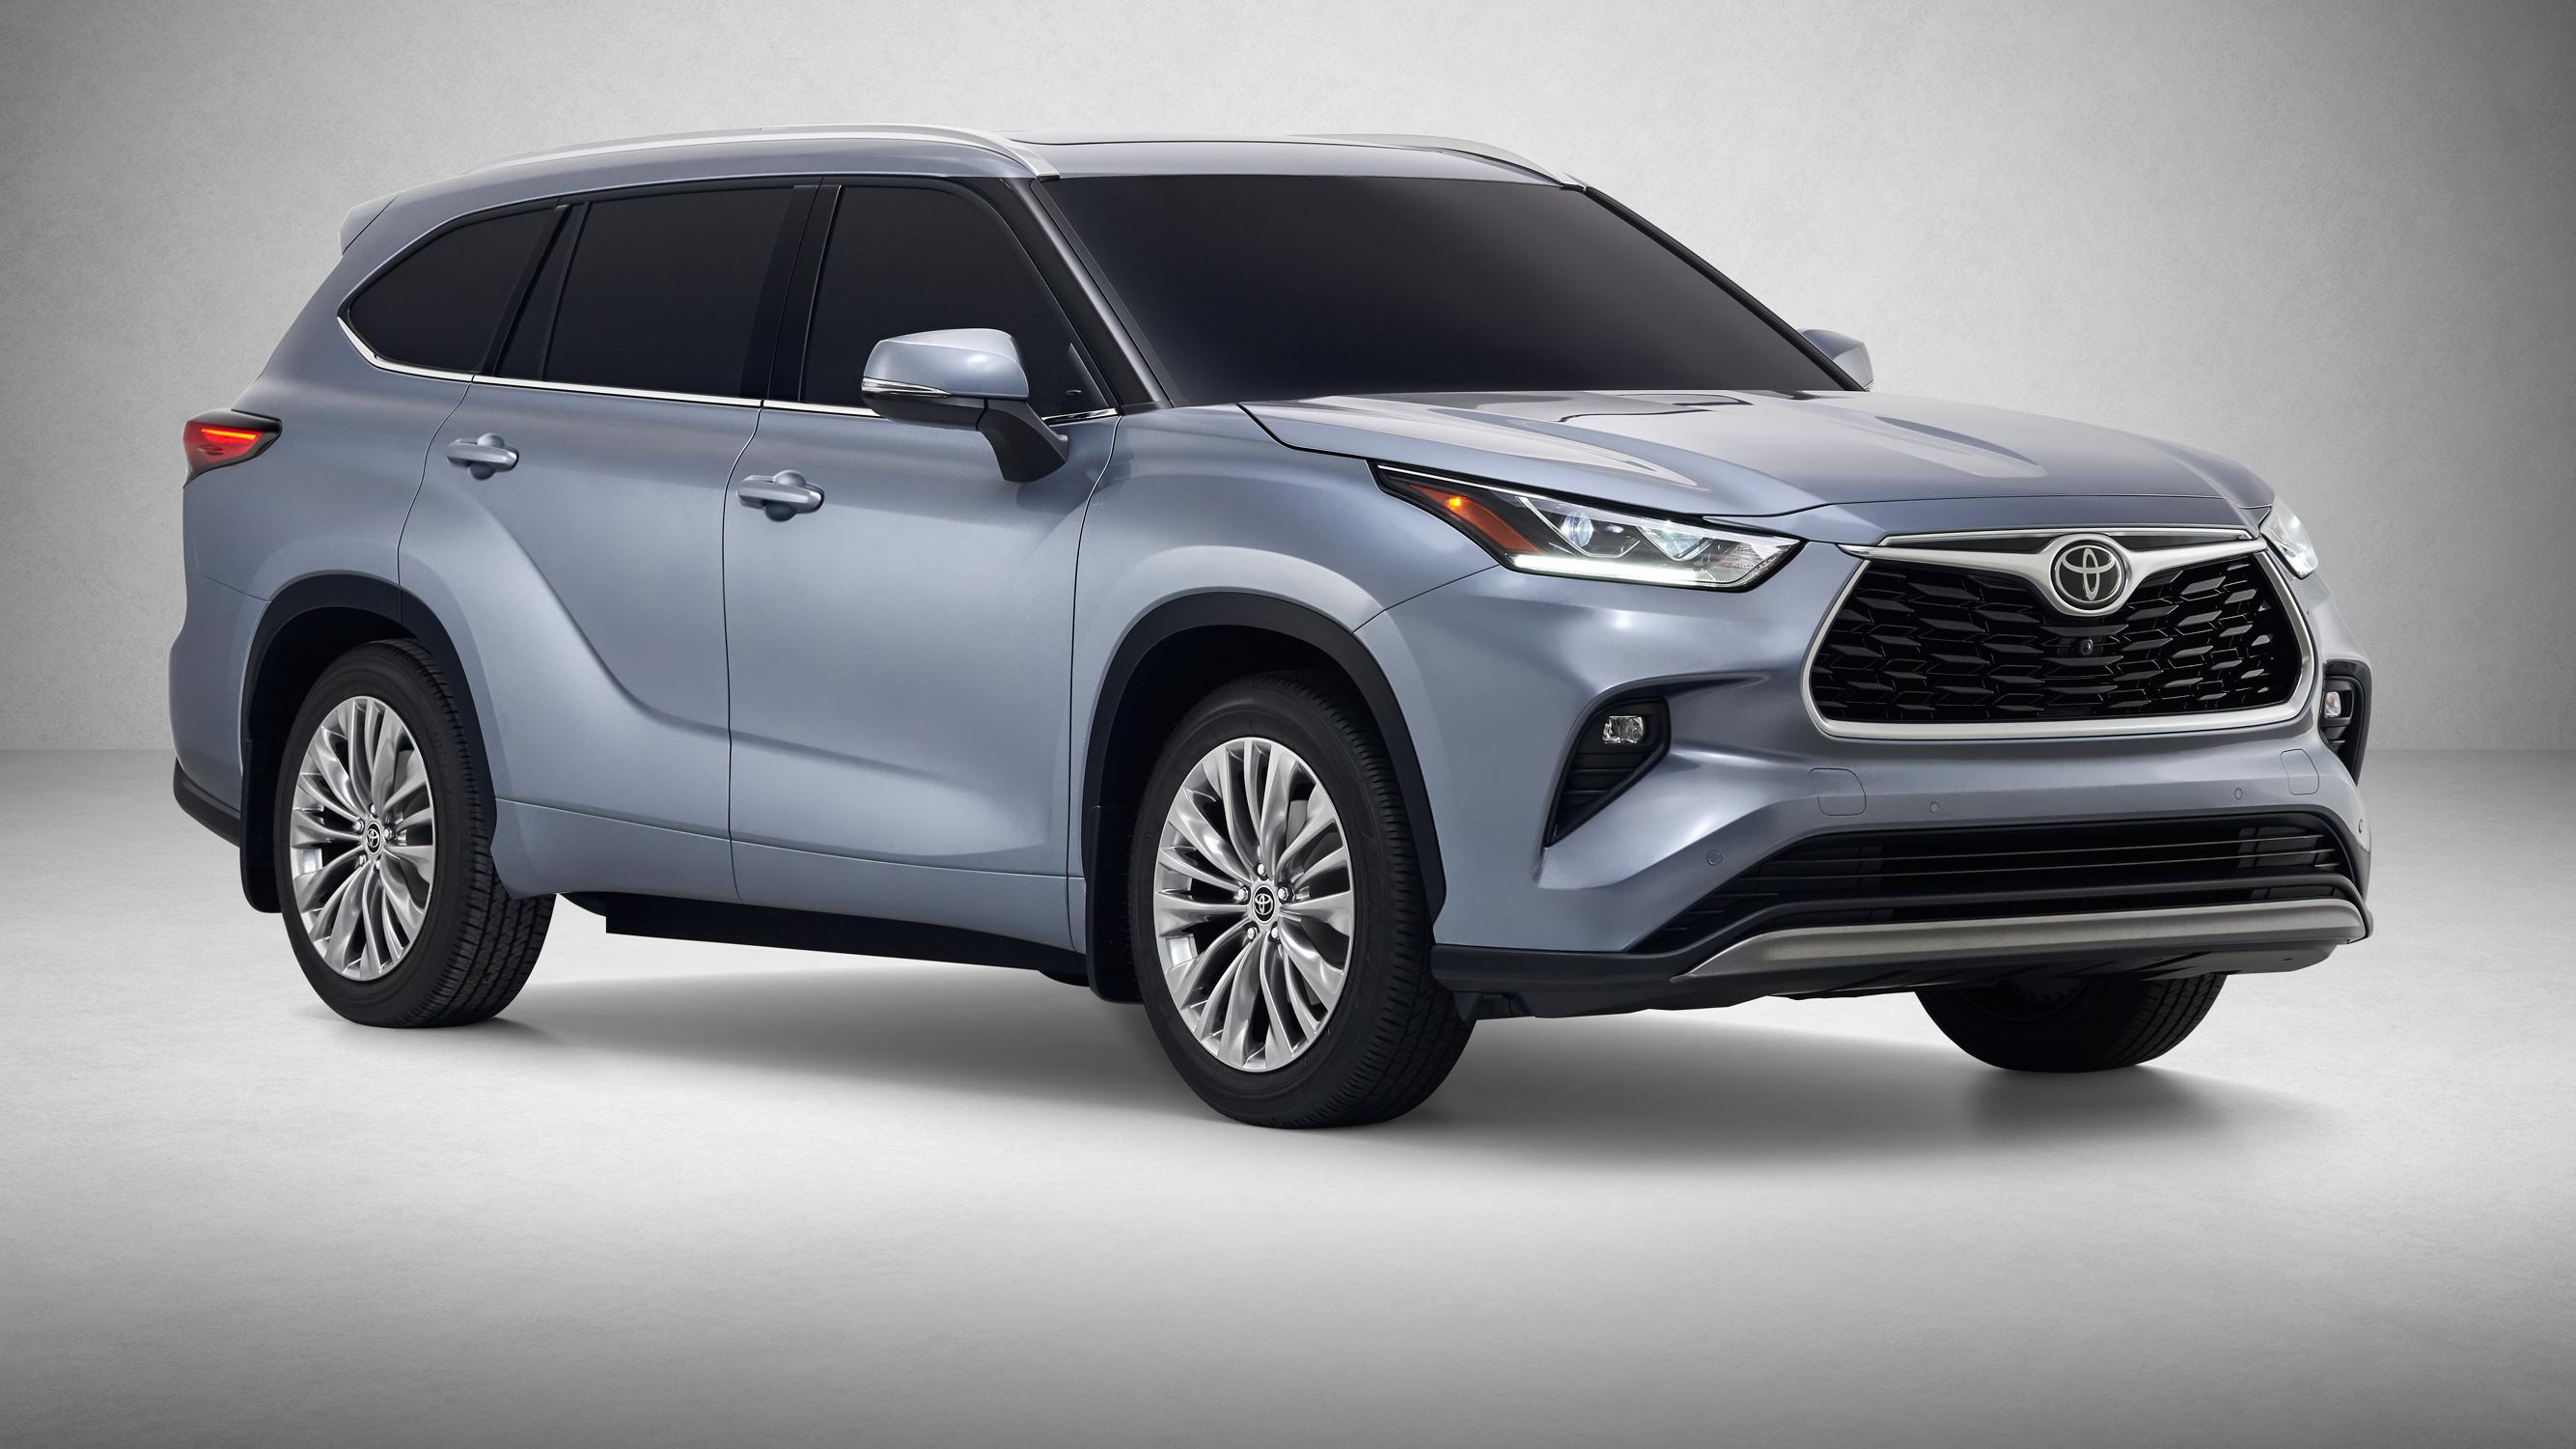 2018 Toyota Kluger: Specs, Design, Arrival >> 2020 Toyota Kluger Unveiled Australia To Get Hybrid Power